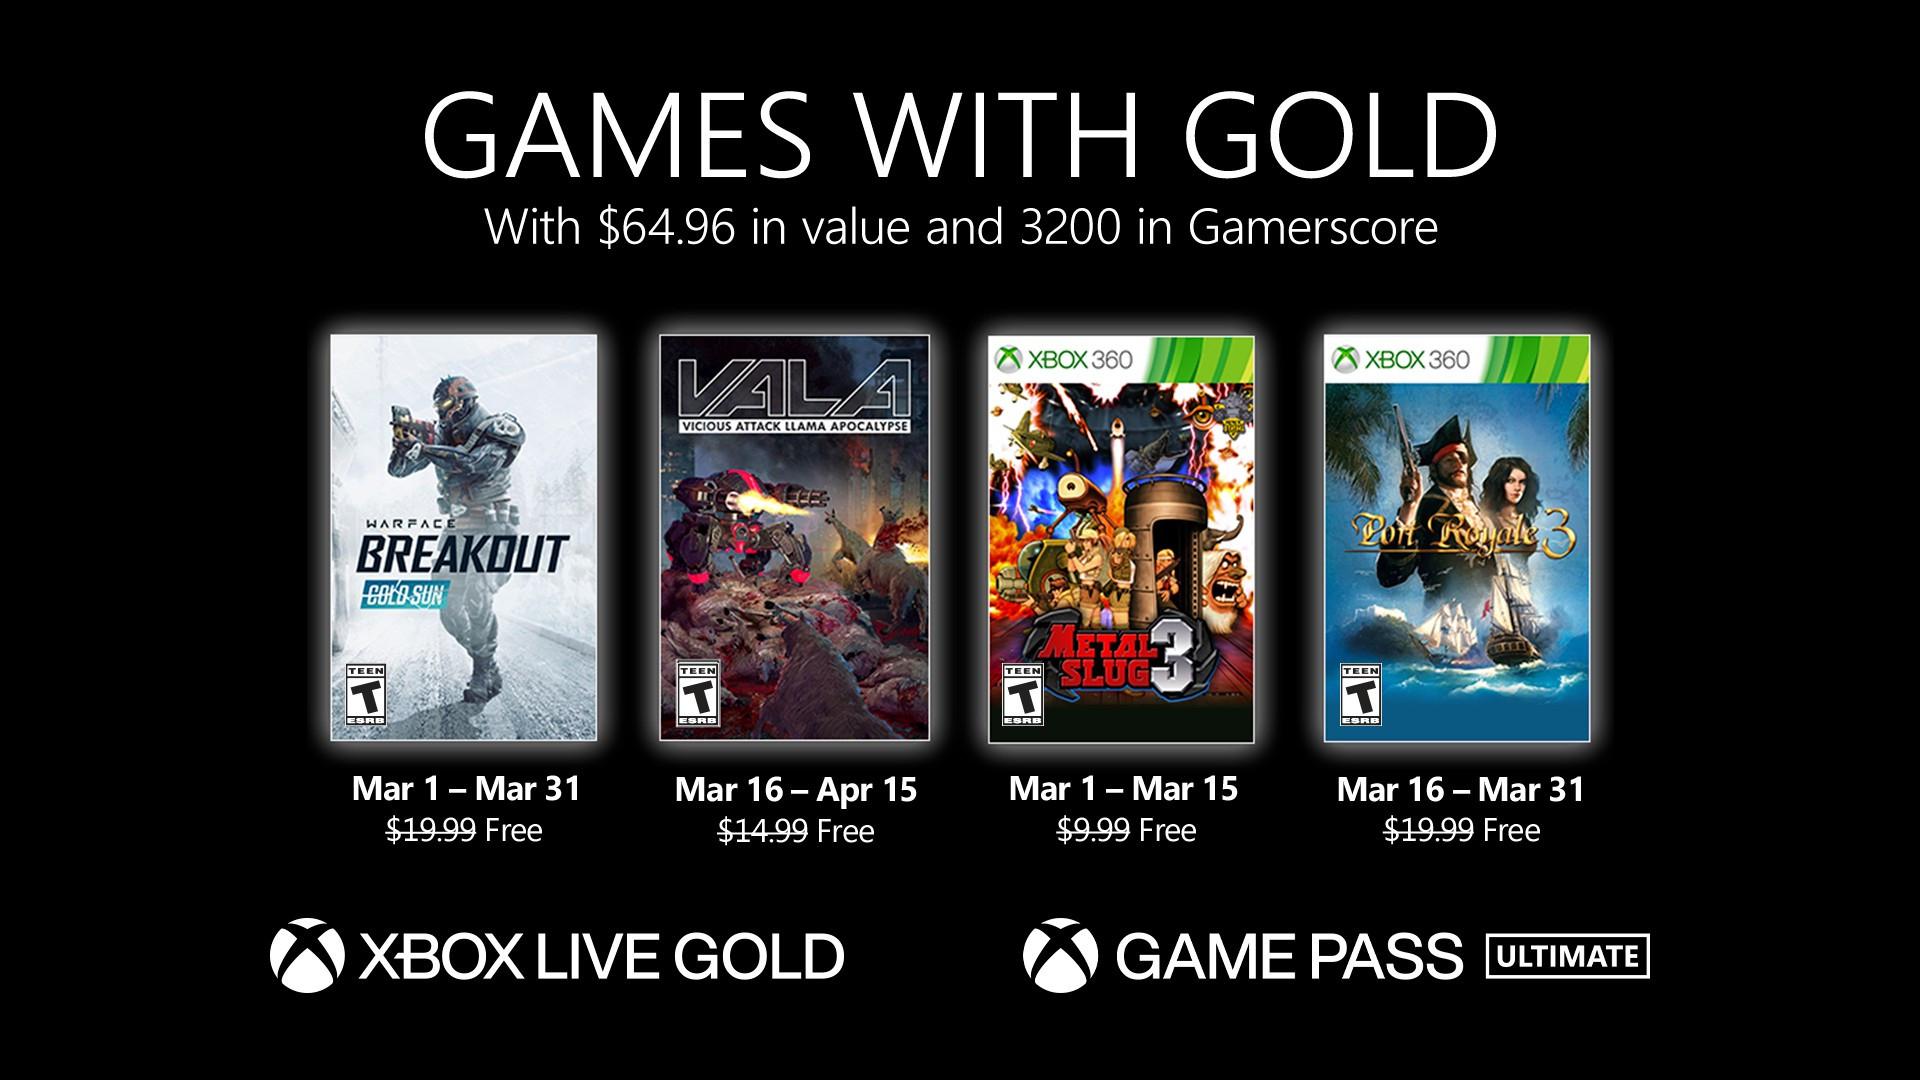 Xbox Games with Gold (March 2021) - Warface: Breakout, Metal Slug 3, Port Royale 3, Vicious Attack Llama Apocalypse